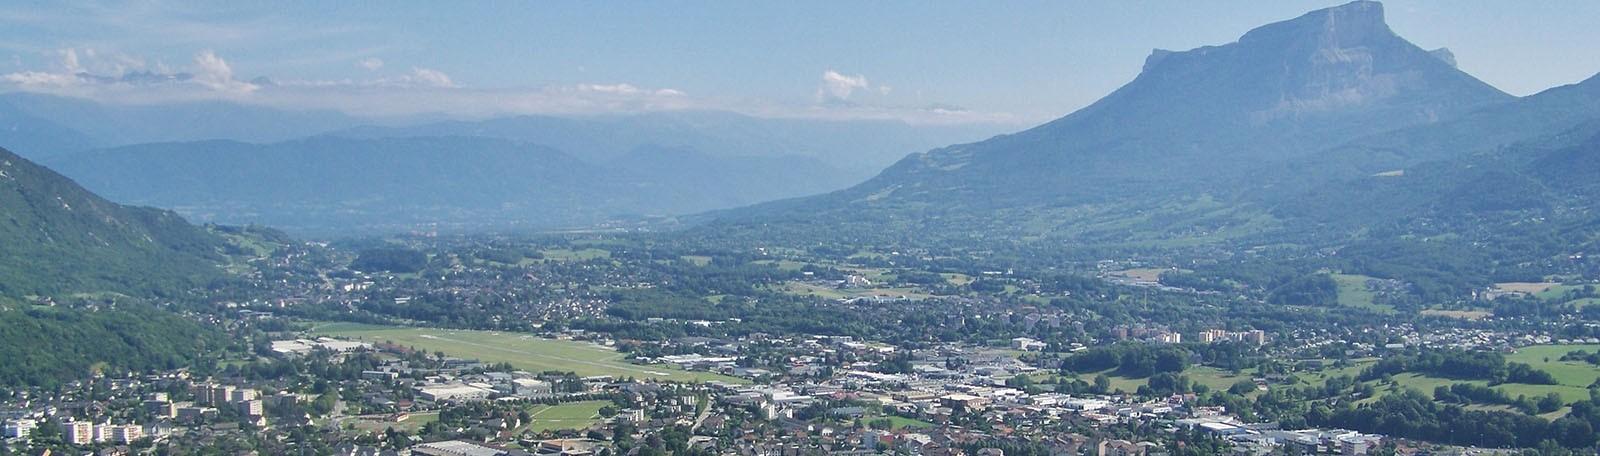 Parking Hôpital P3 - Parkeren in Chambéry | Q-Park